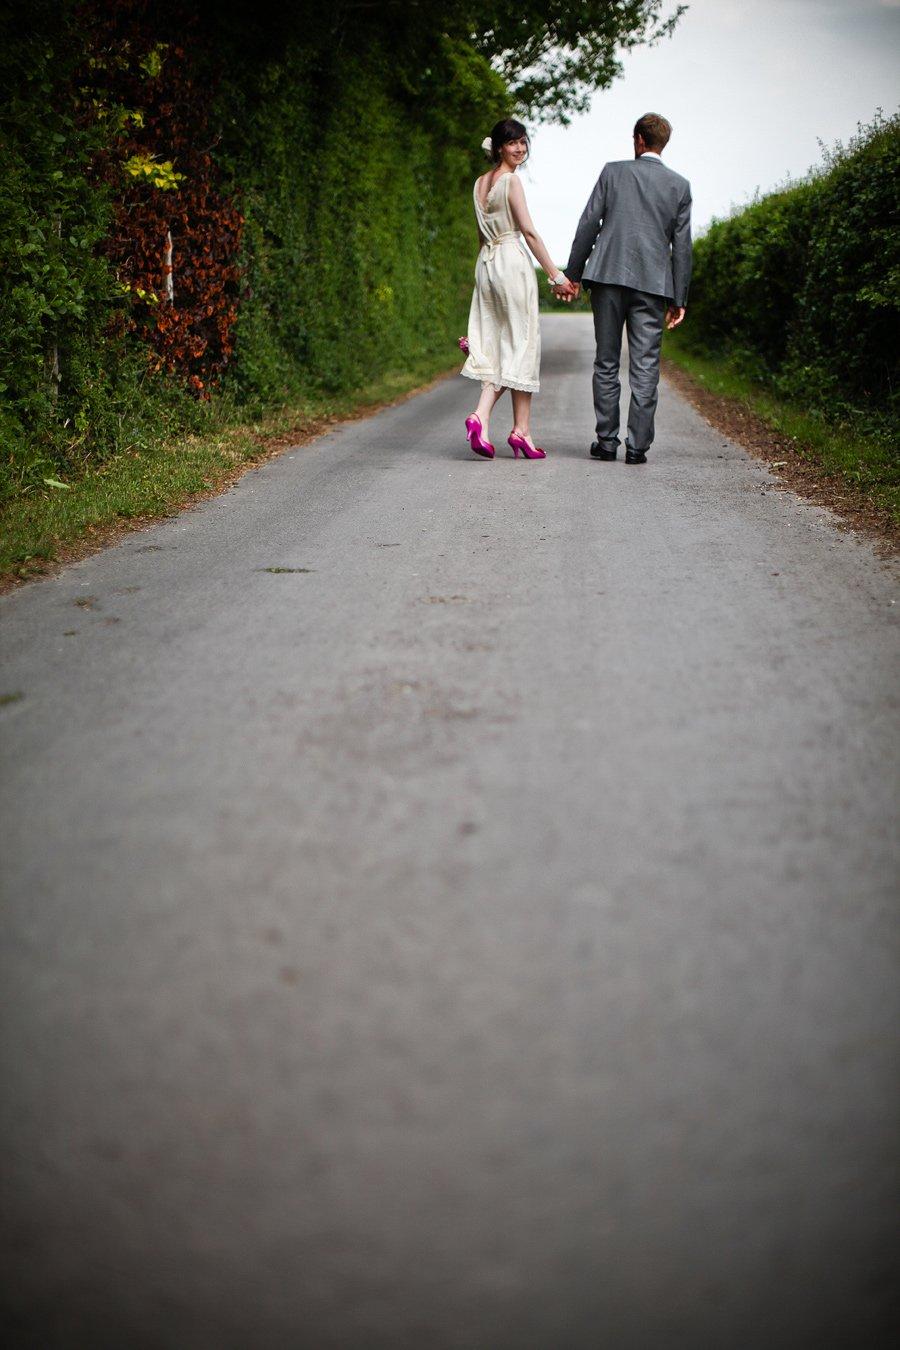 Berkshire-Wedding-Photography-Fazackarley-Aisling-and-Philip-27